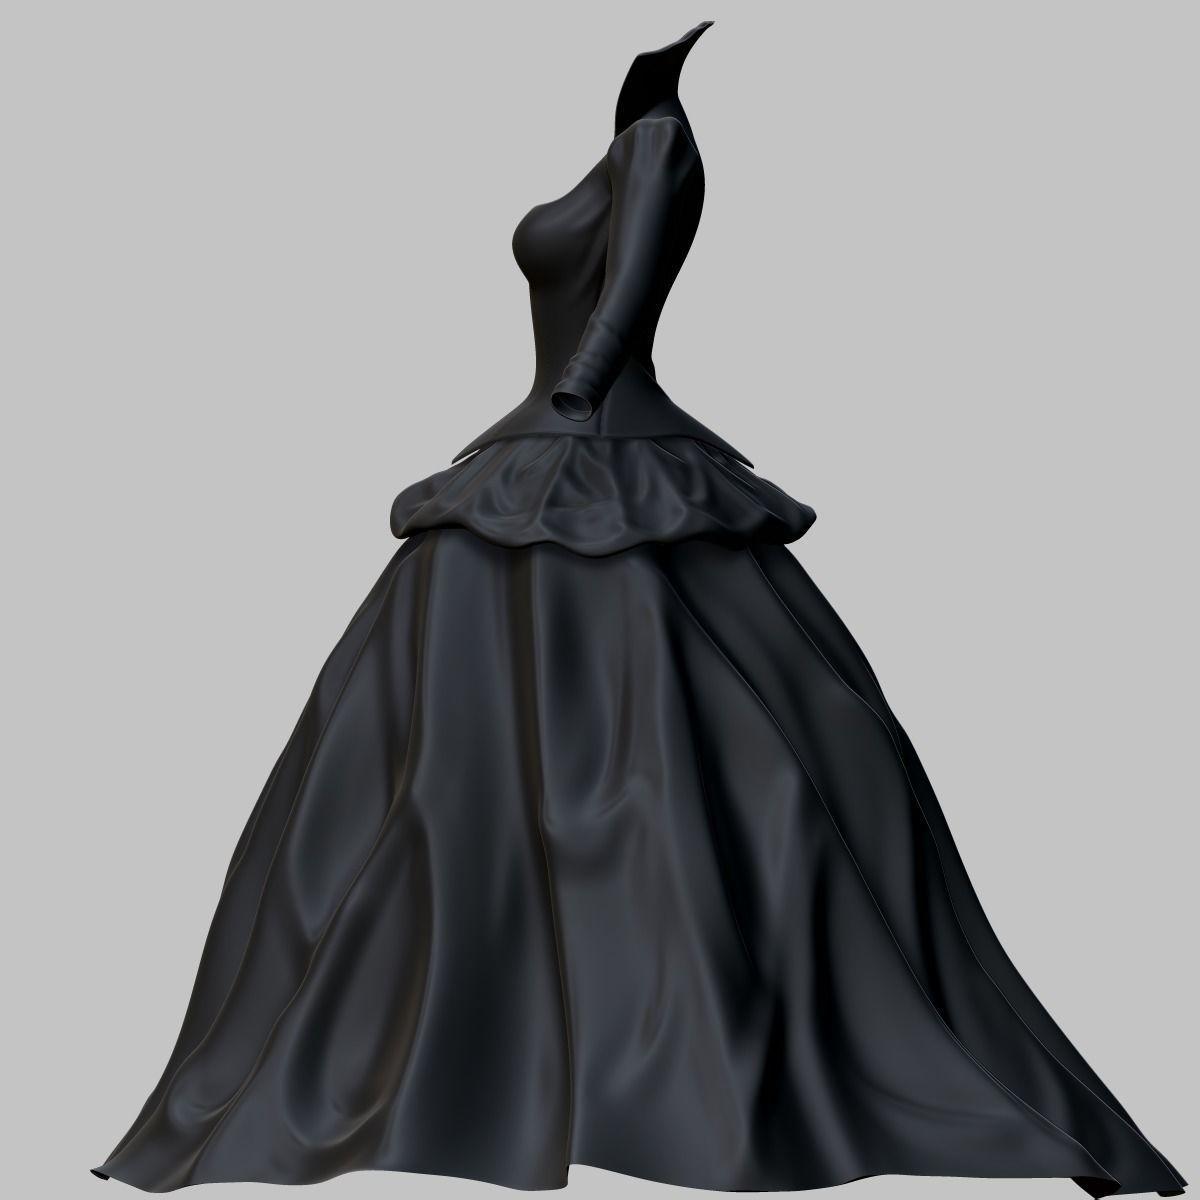 3D model VR / AR ready Victorian Gothic Dress | CGTrader